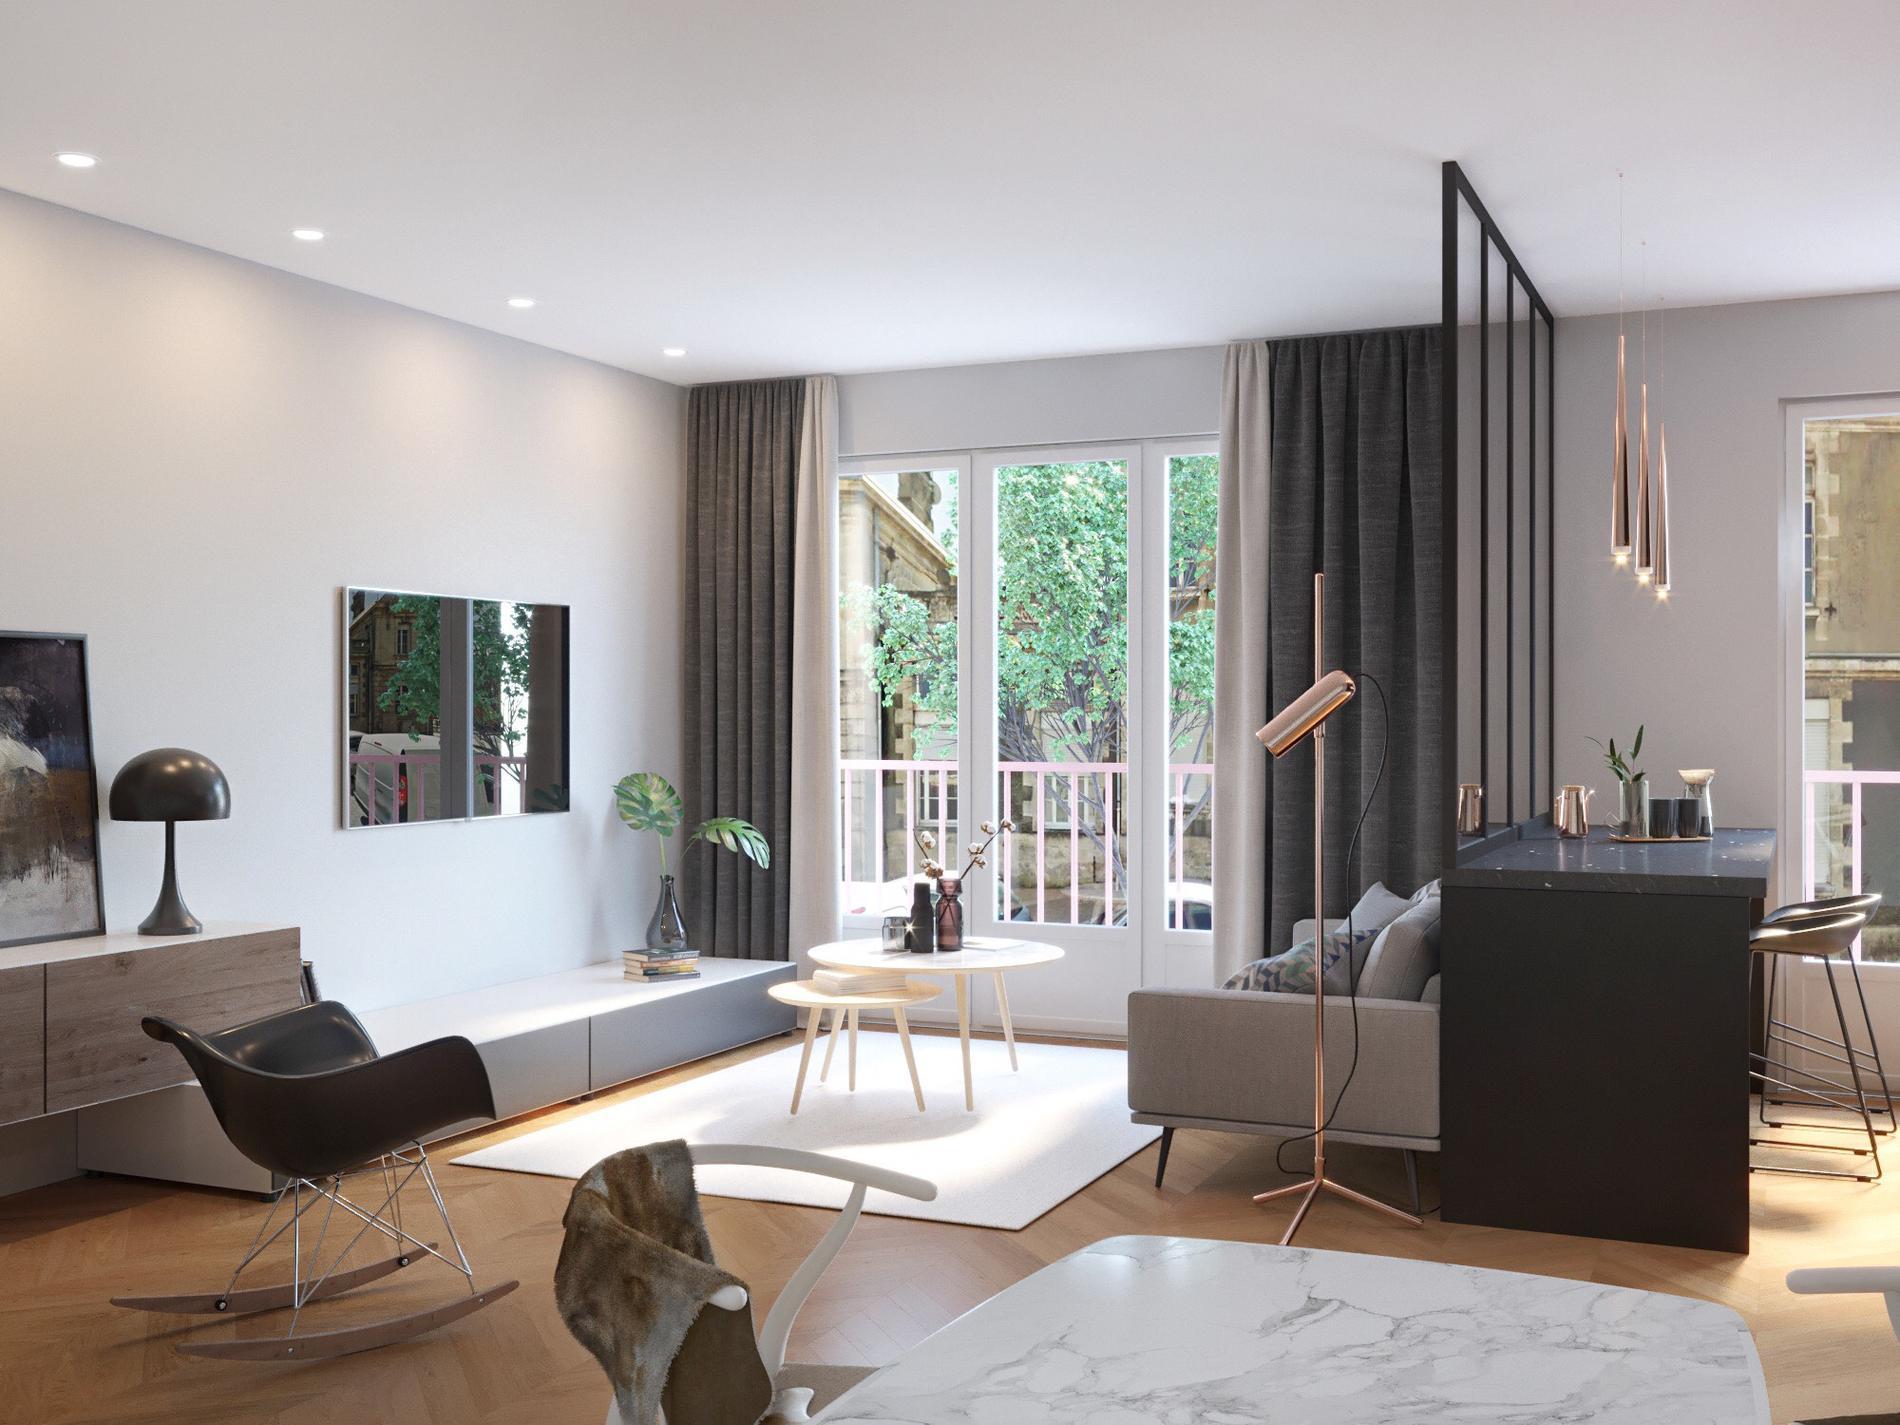 comment ouvrir sa cuisine sur le salon madame figaro. Black Bedroom Furniture Sets. Home Design Ideas